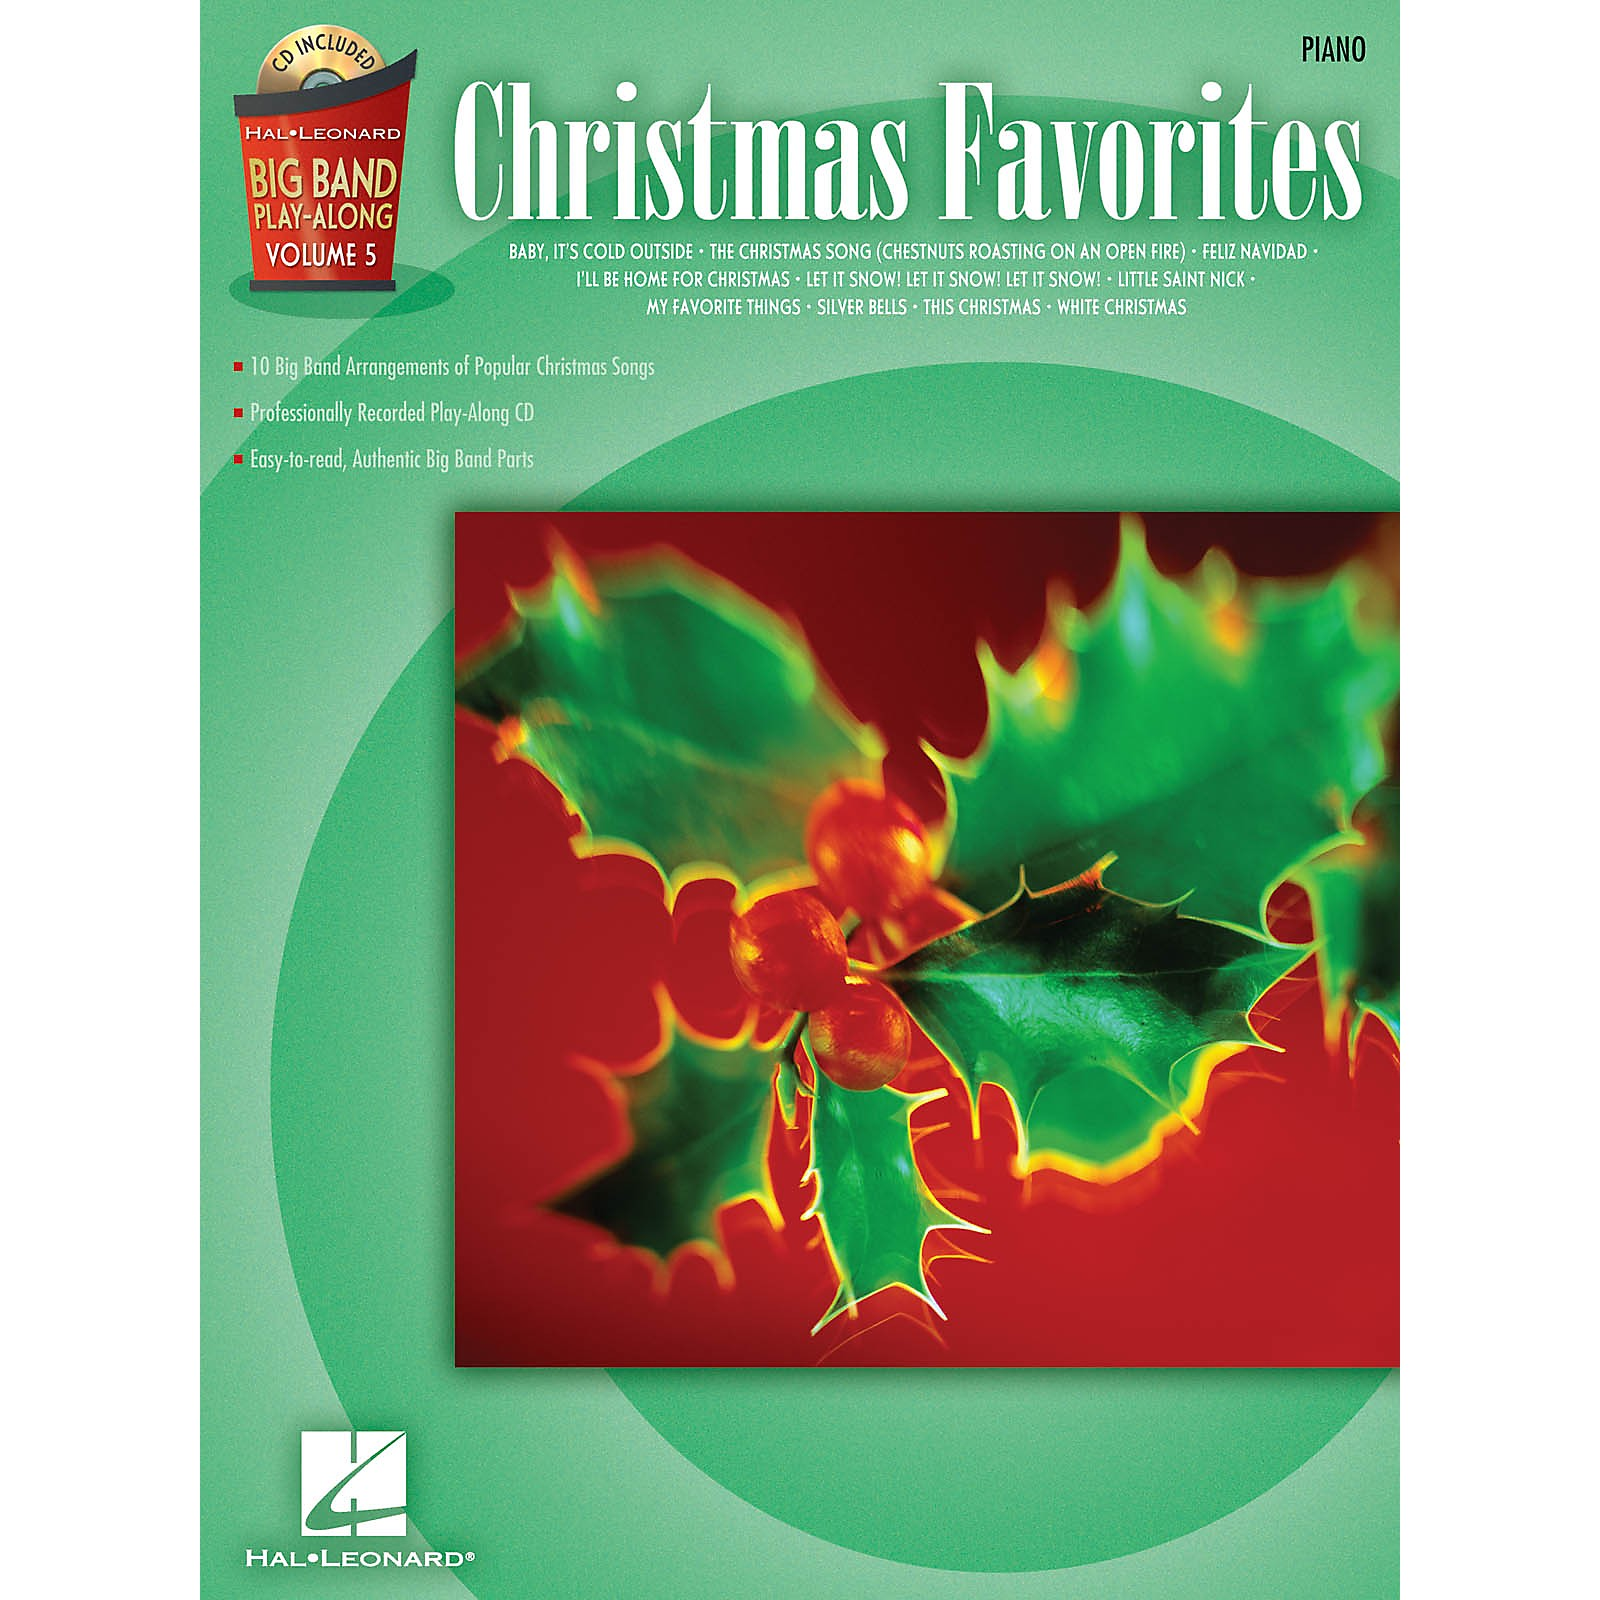 Hal Leonard Christmas Favorites - Piano (Big Band Play-Along Volume 5) Big Band Play-Along Series Softcover with CD